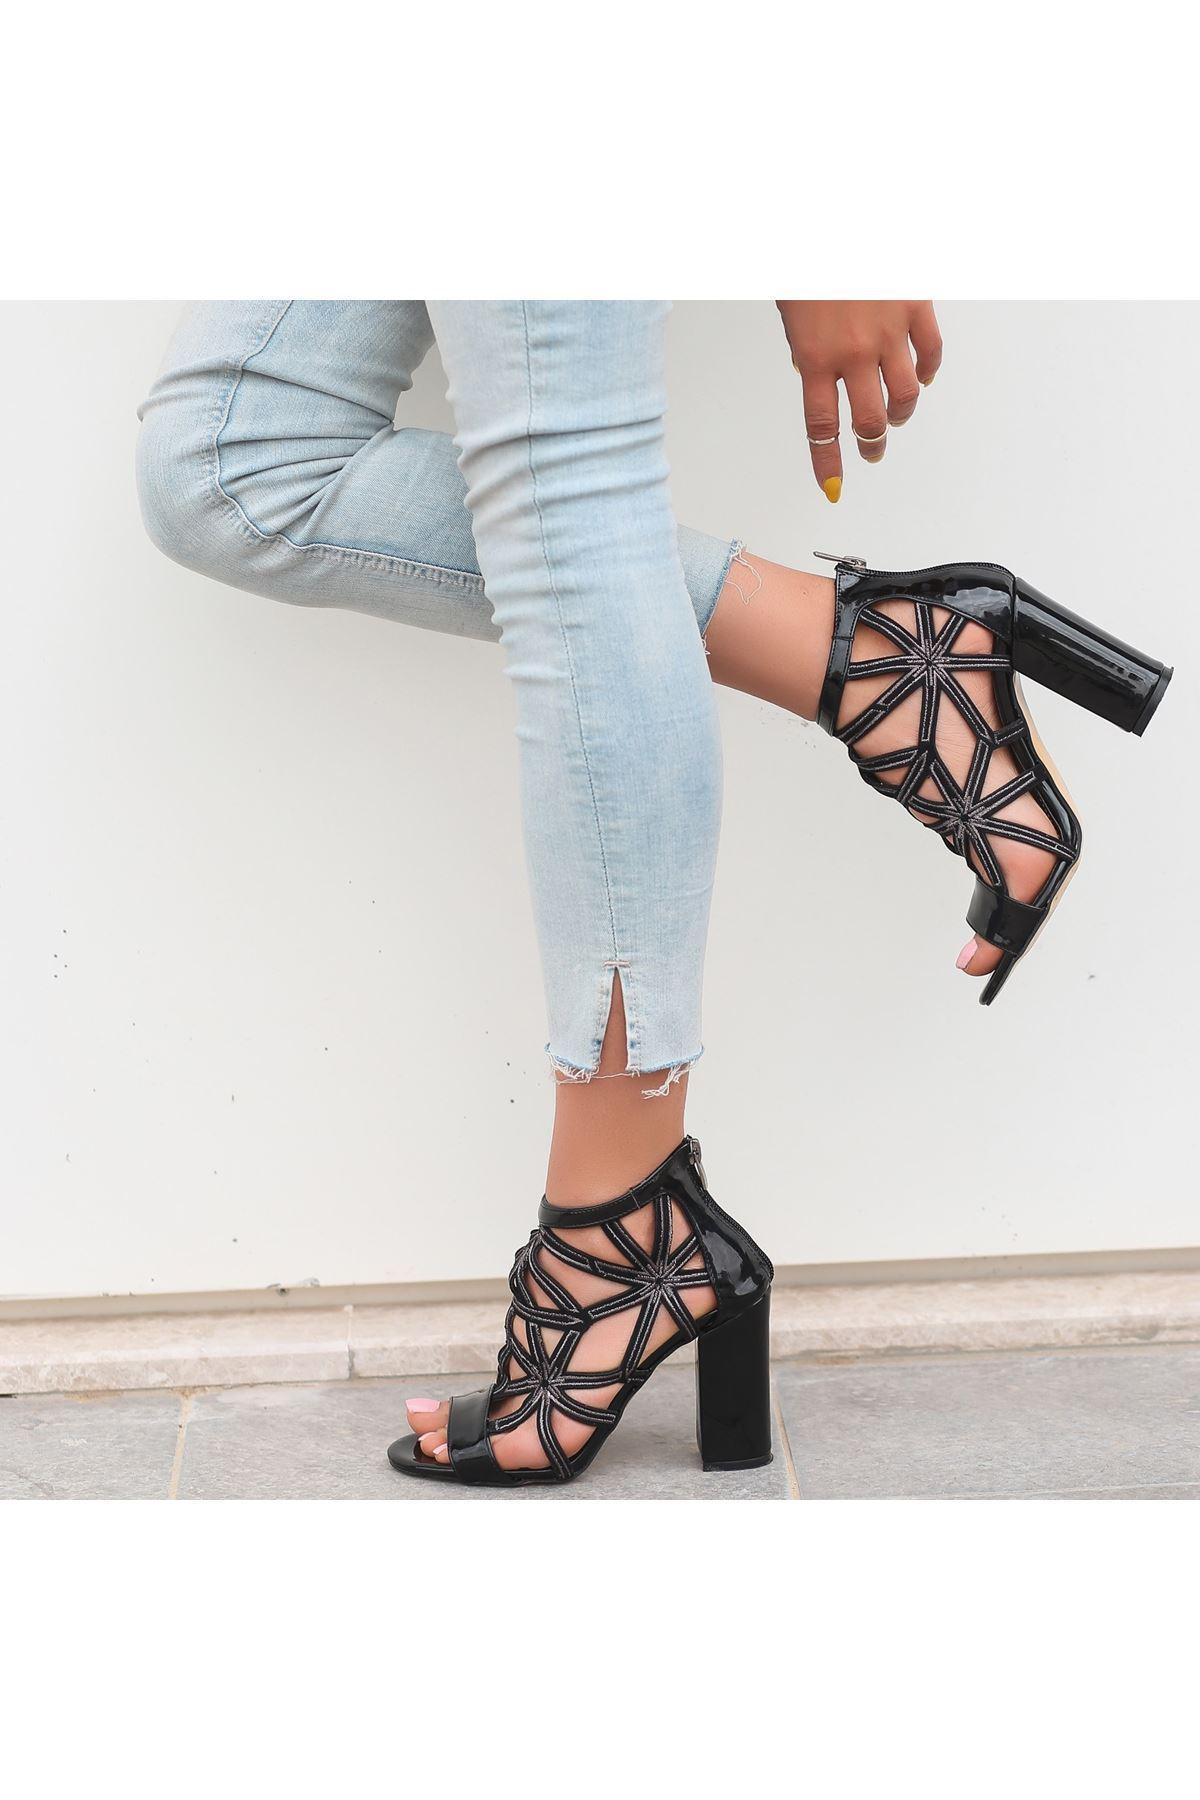 Yumi Siyah Rugan Topuklu Ayakkabı